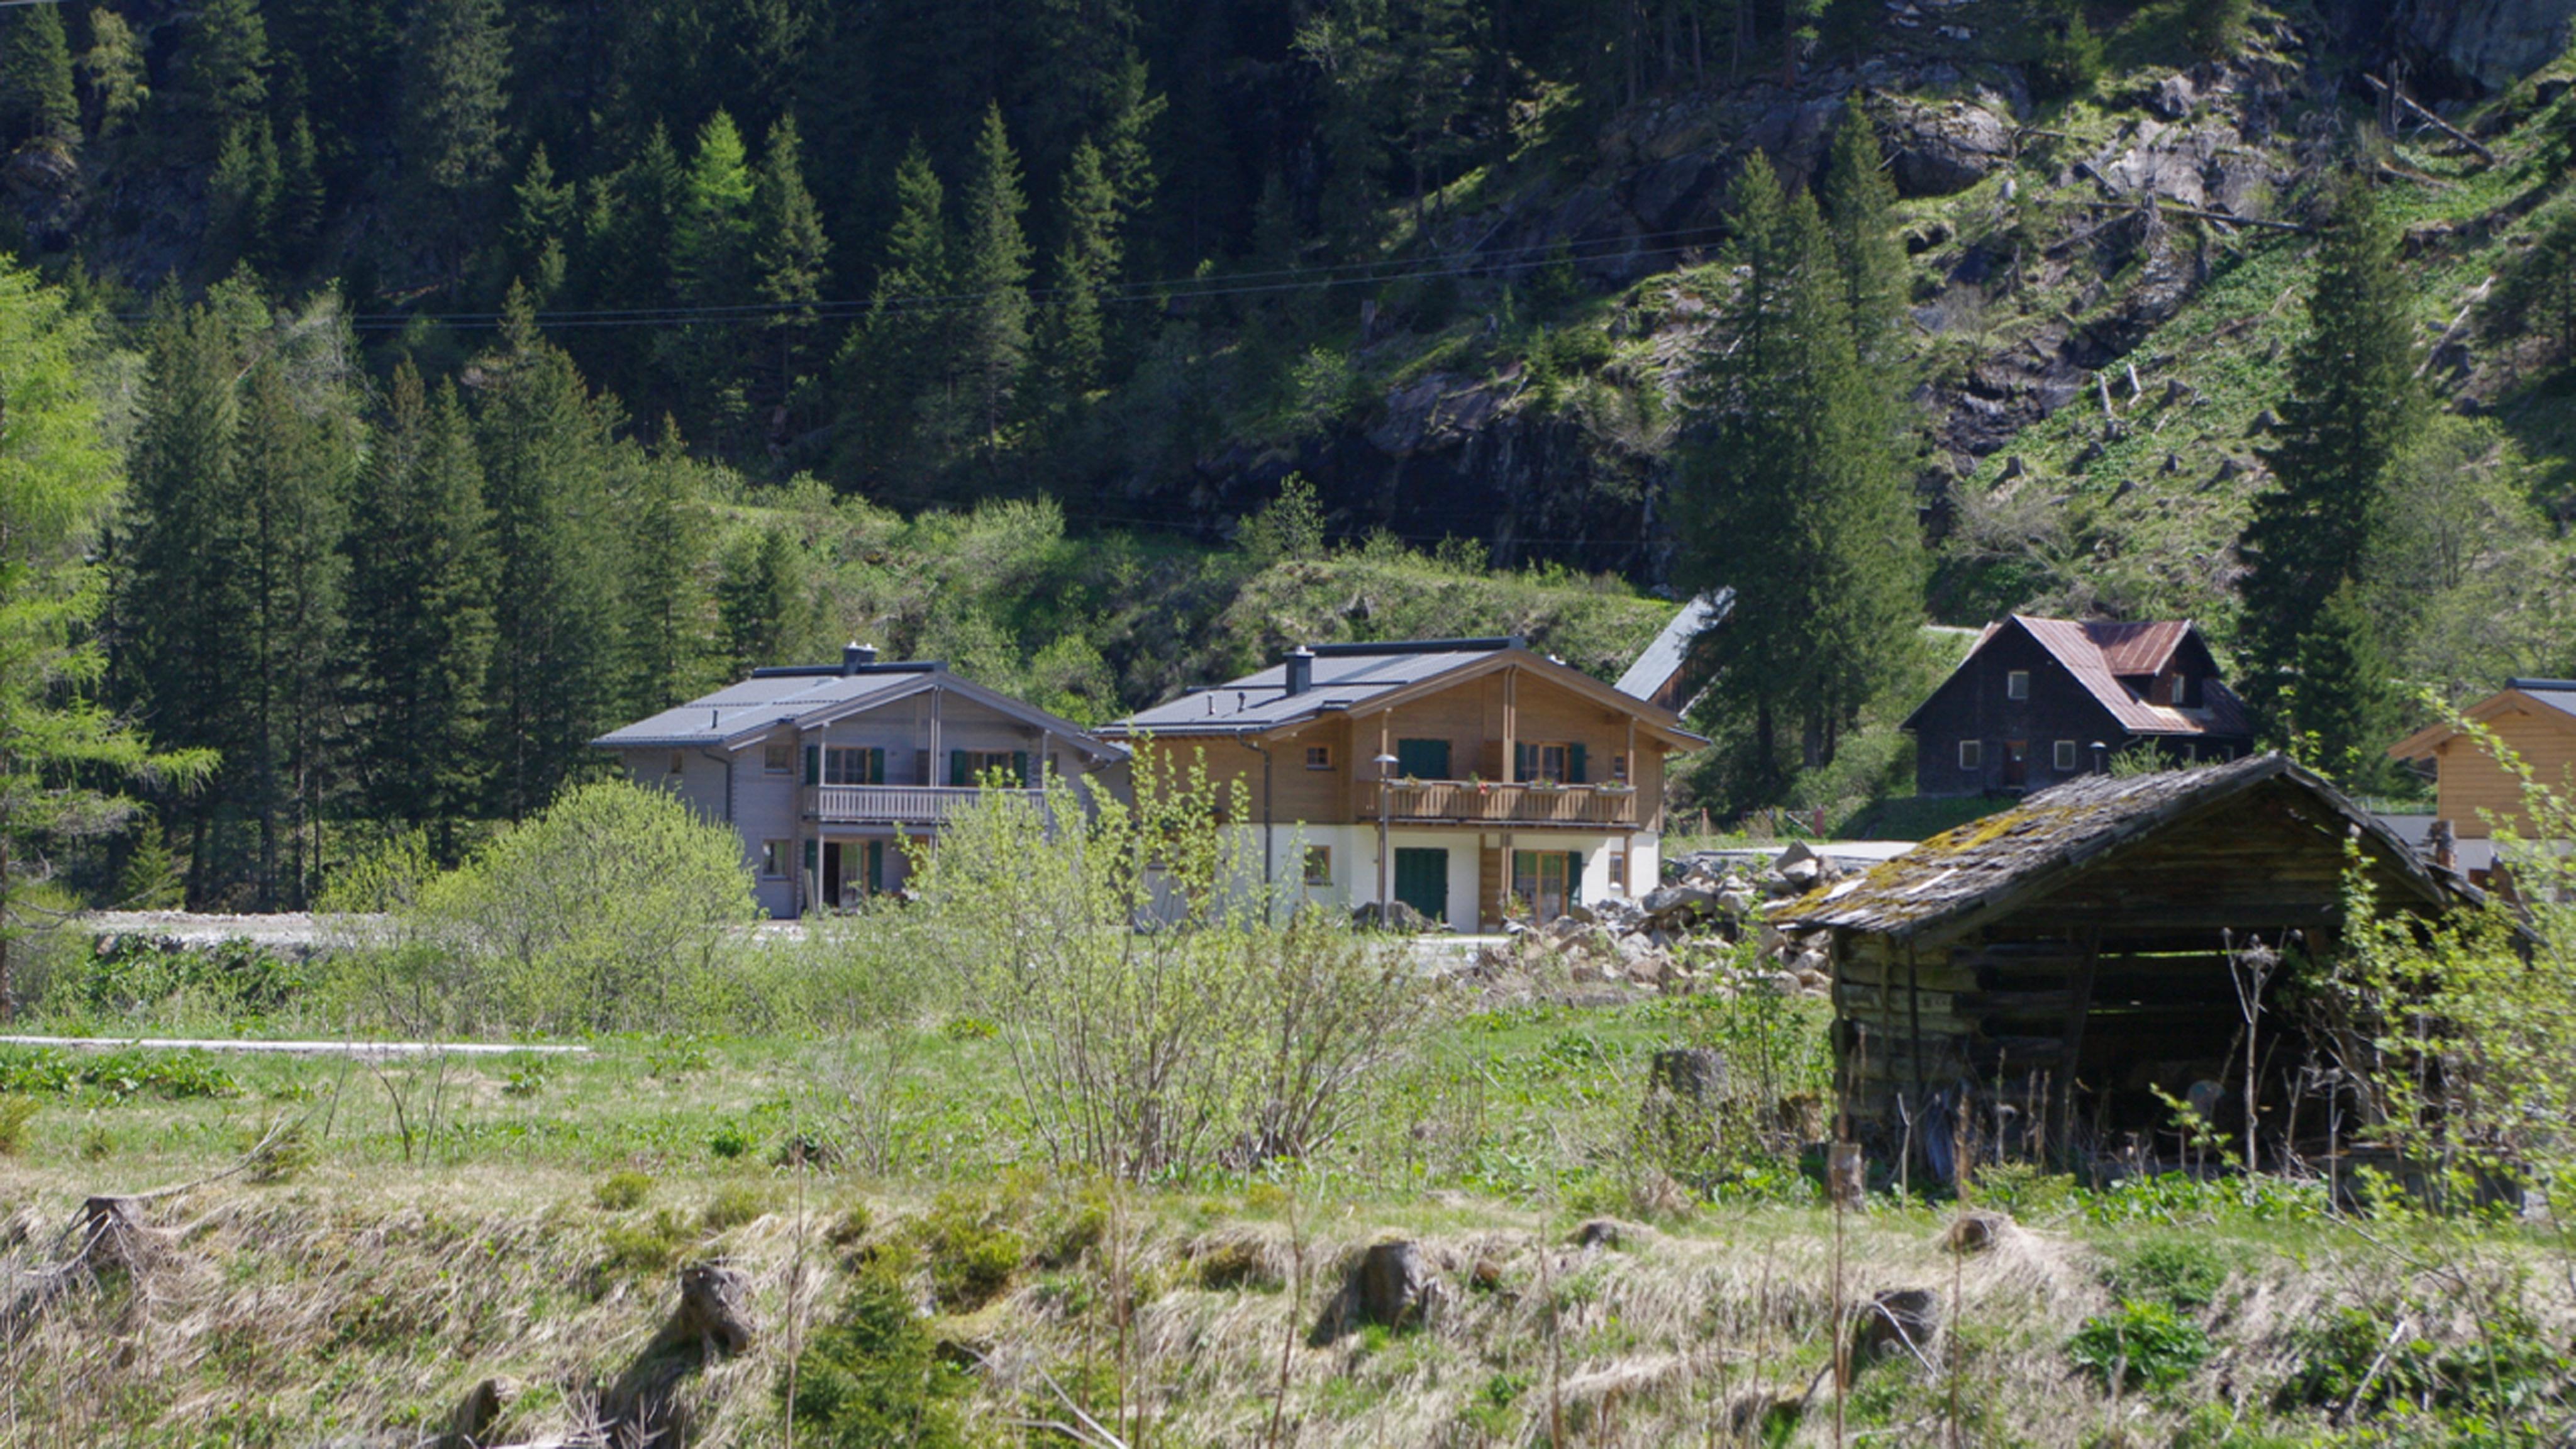 Maison de vacances Lodge Seeblick am Skilift und Bergsee für 5 (2636751), Uttendorf, Pinzgau, Salzbourg, Autriche, image 39